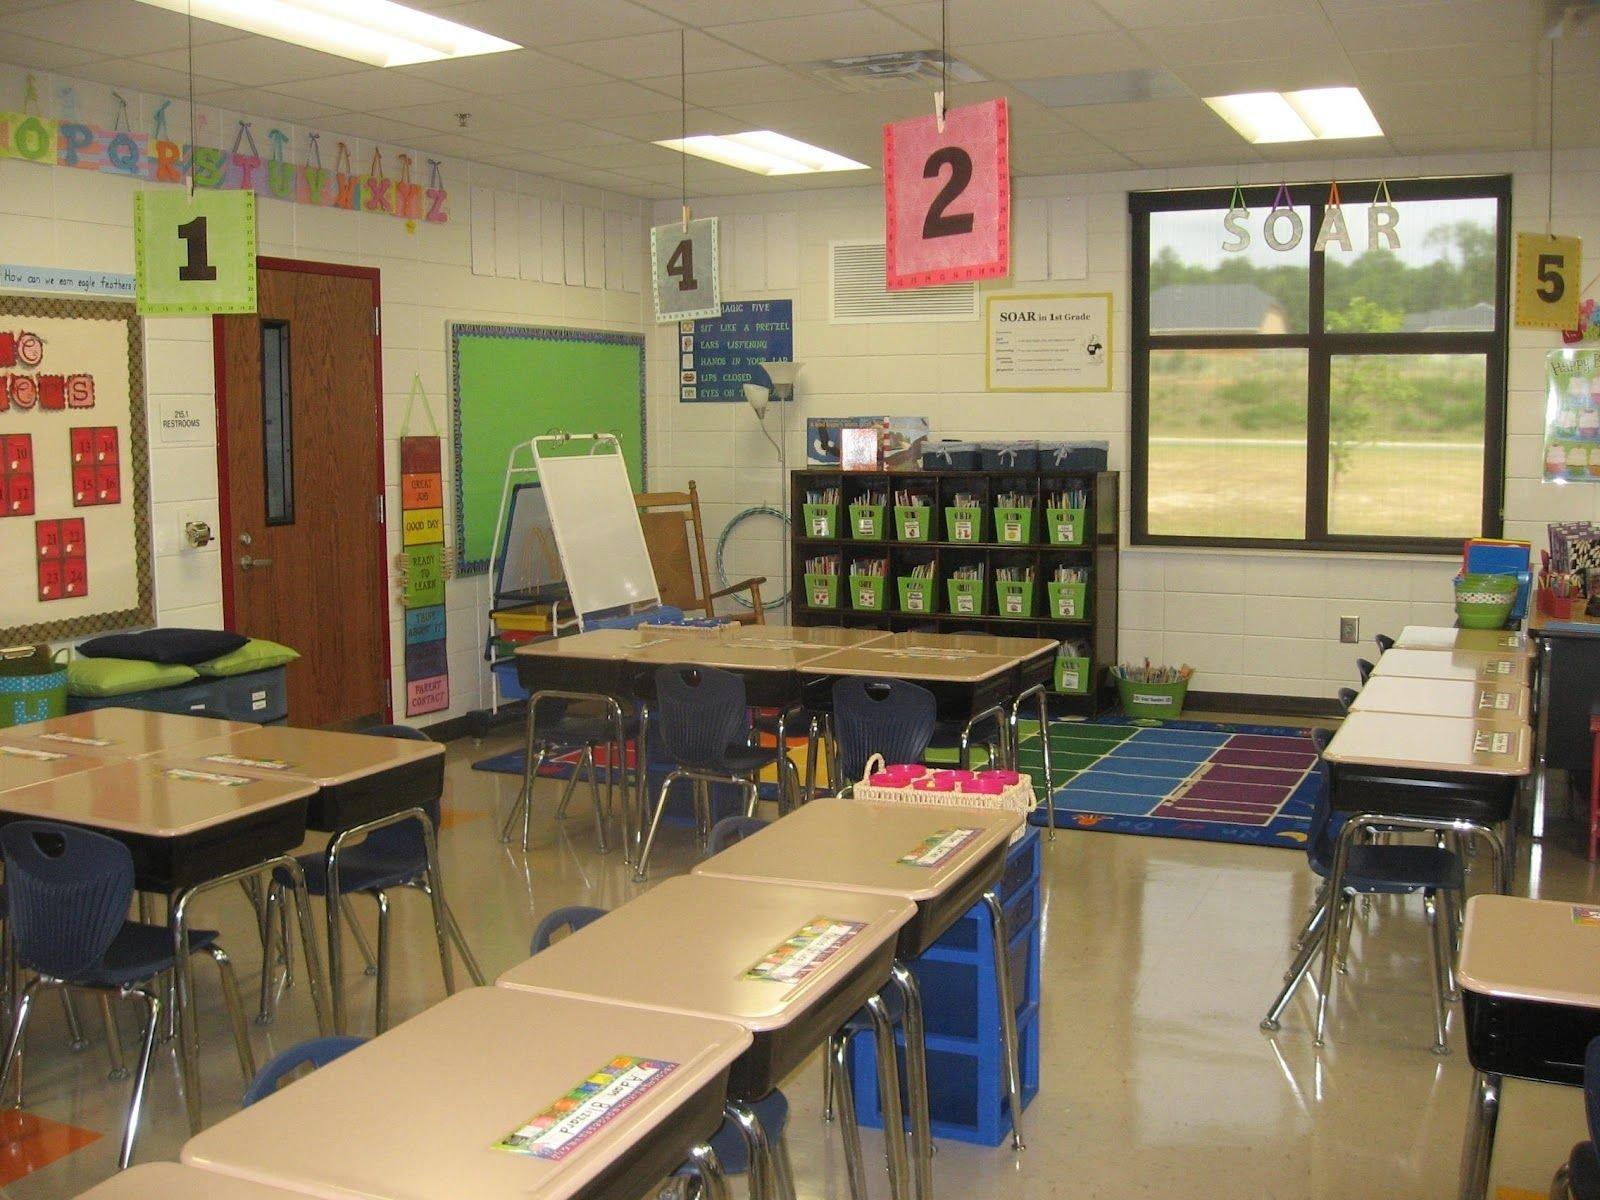 10 Great Social Studies Classroom Decorating Ideas teacher organization ideas way u meeting tips and is classroom 2021